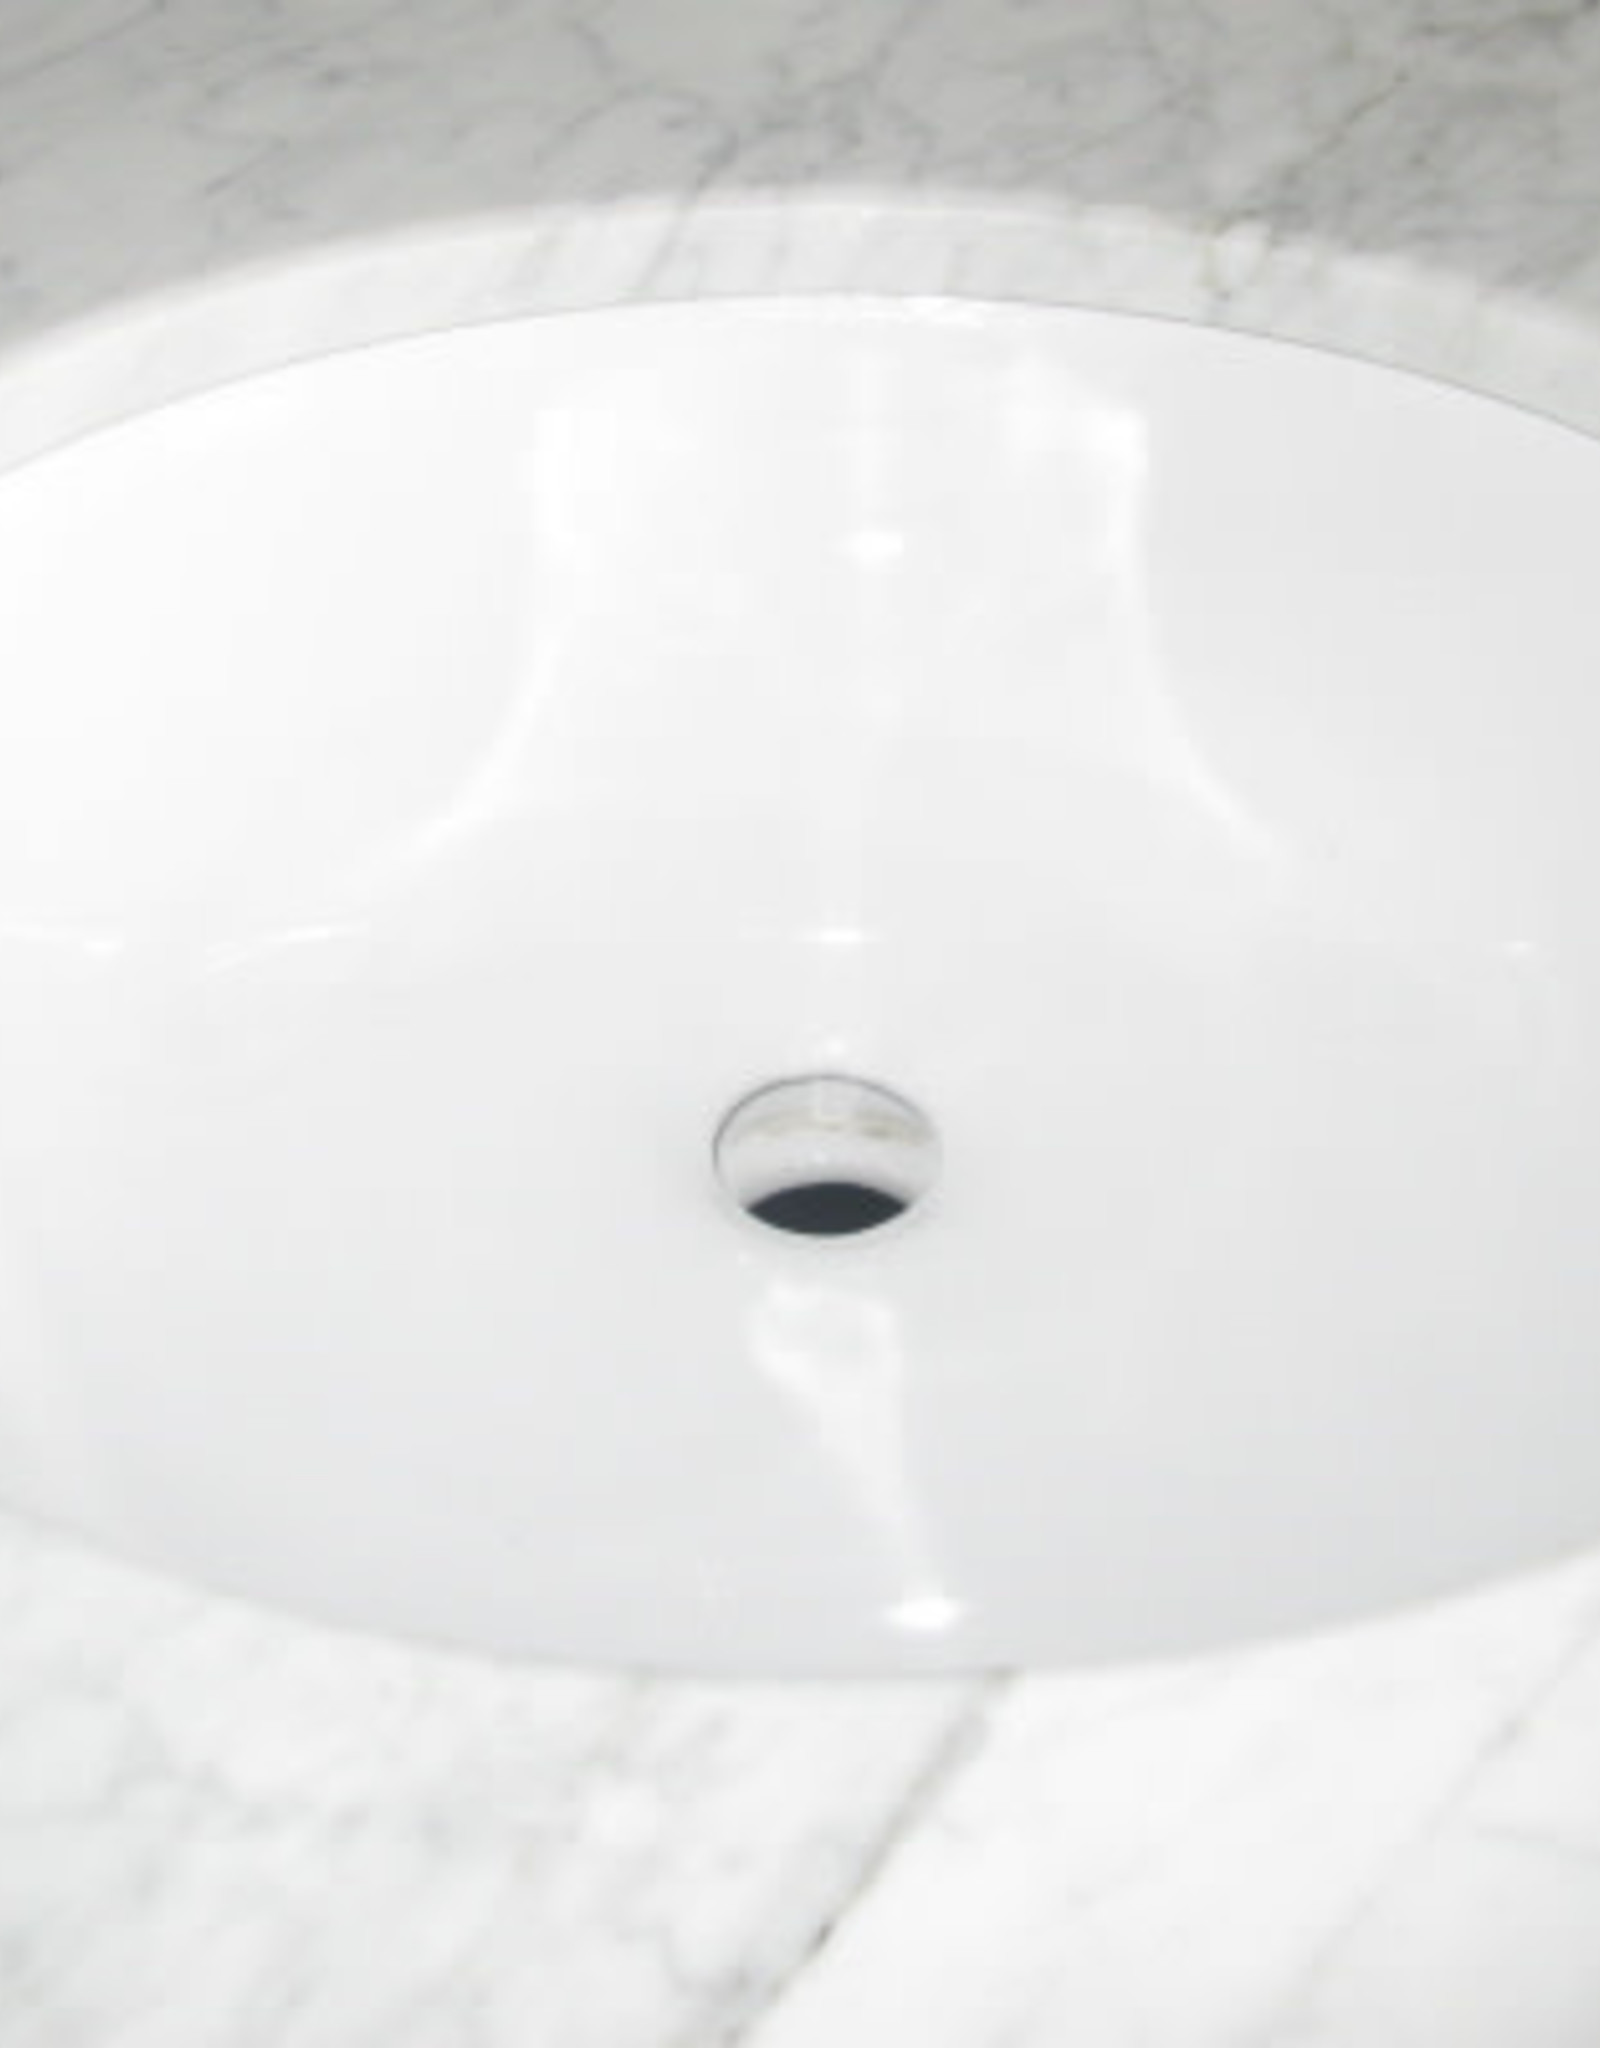 Bosco Bosco 200017 Oval Undermount Ceramic sink